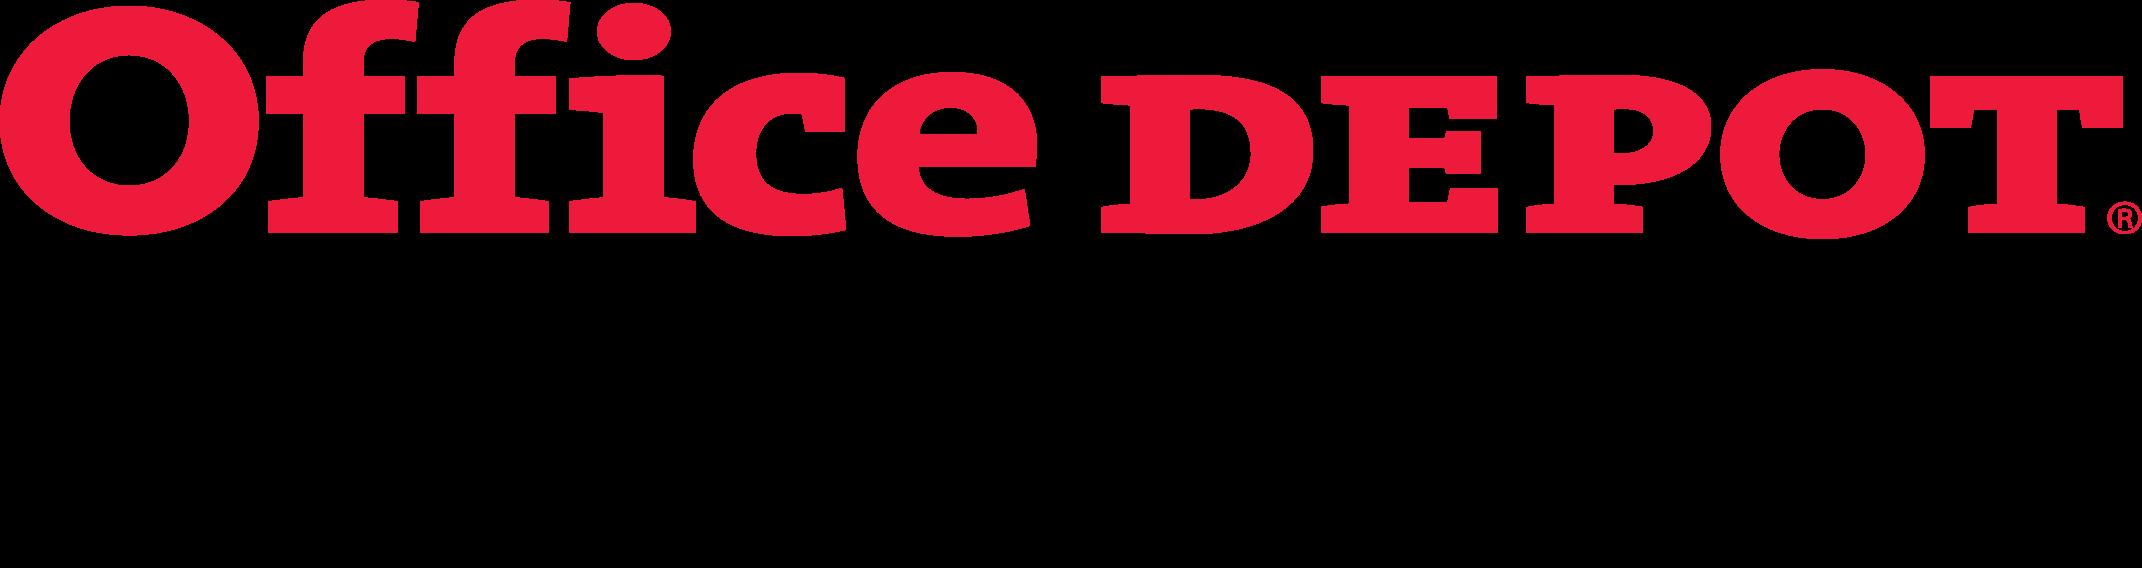 Office depot color printing costs - Nase Benefit Details Office Depot